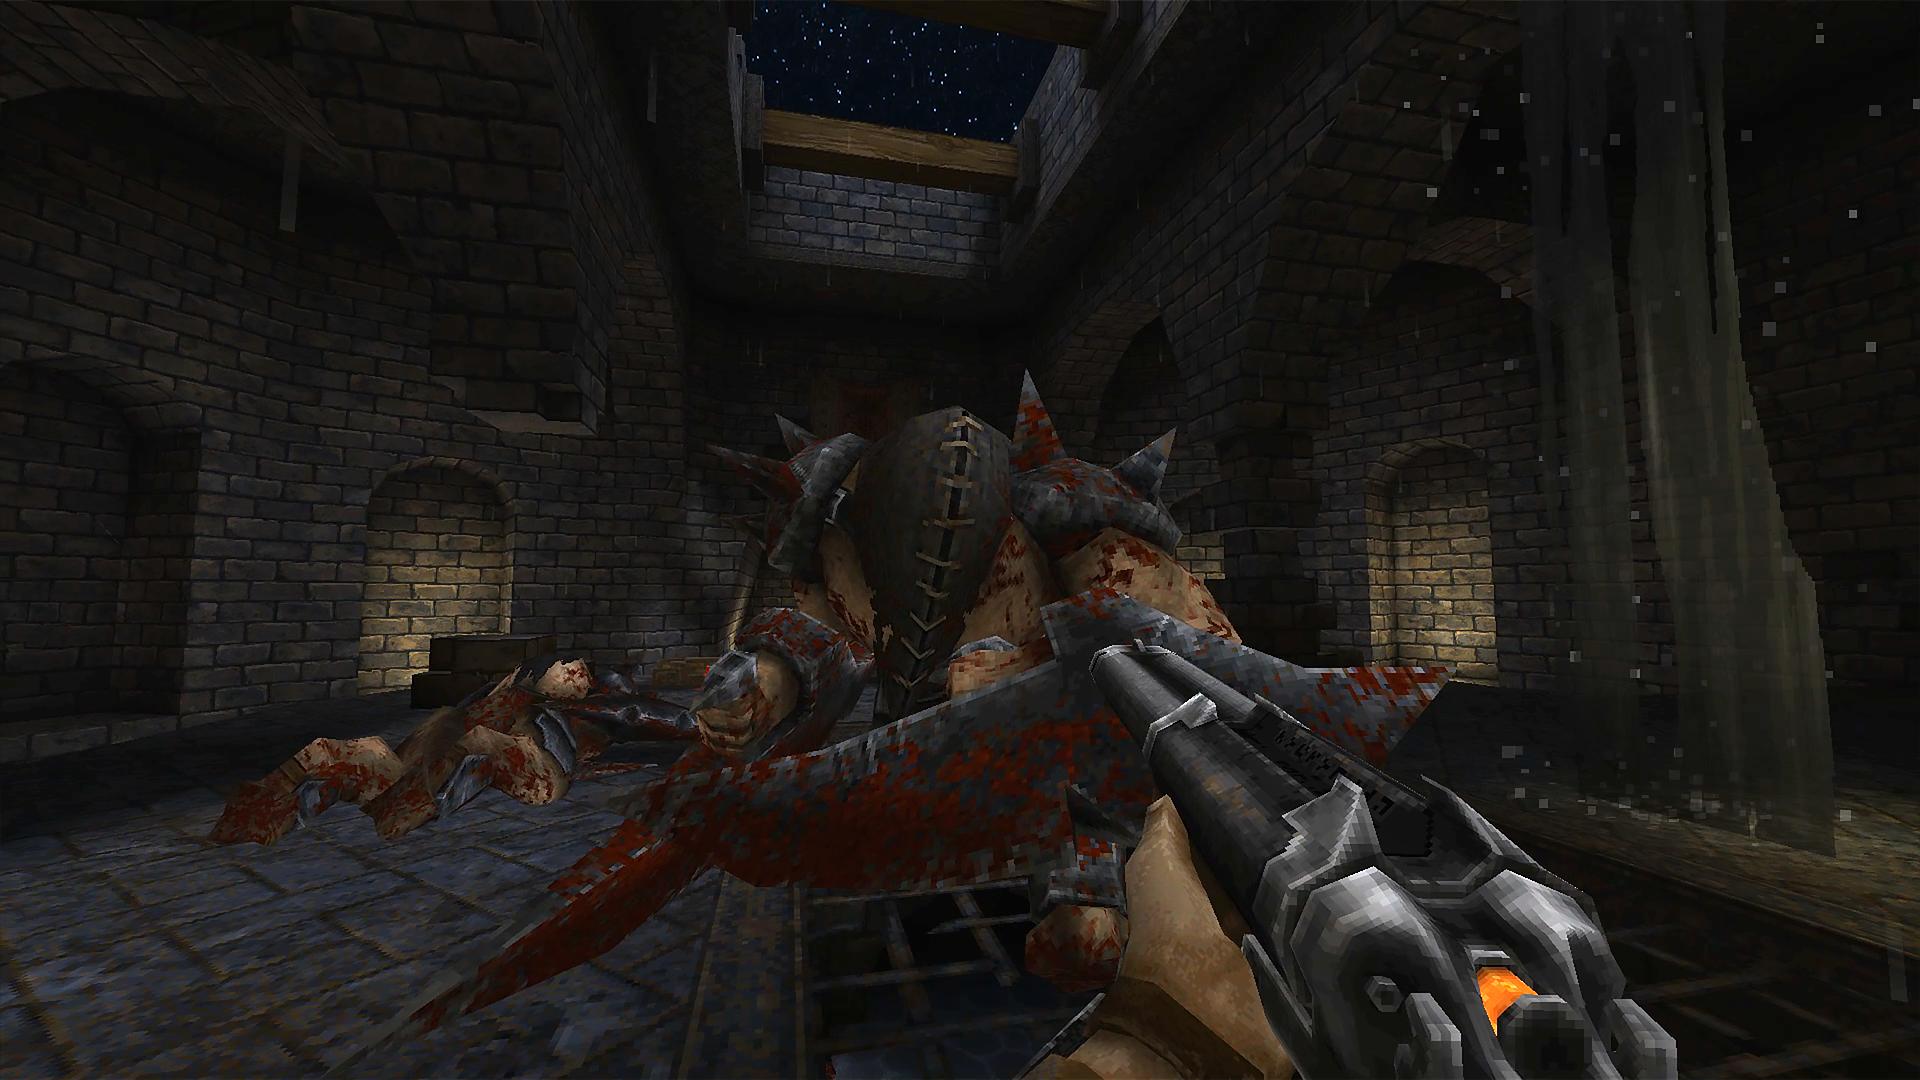 Wrath screenshot